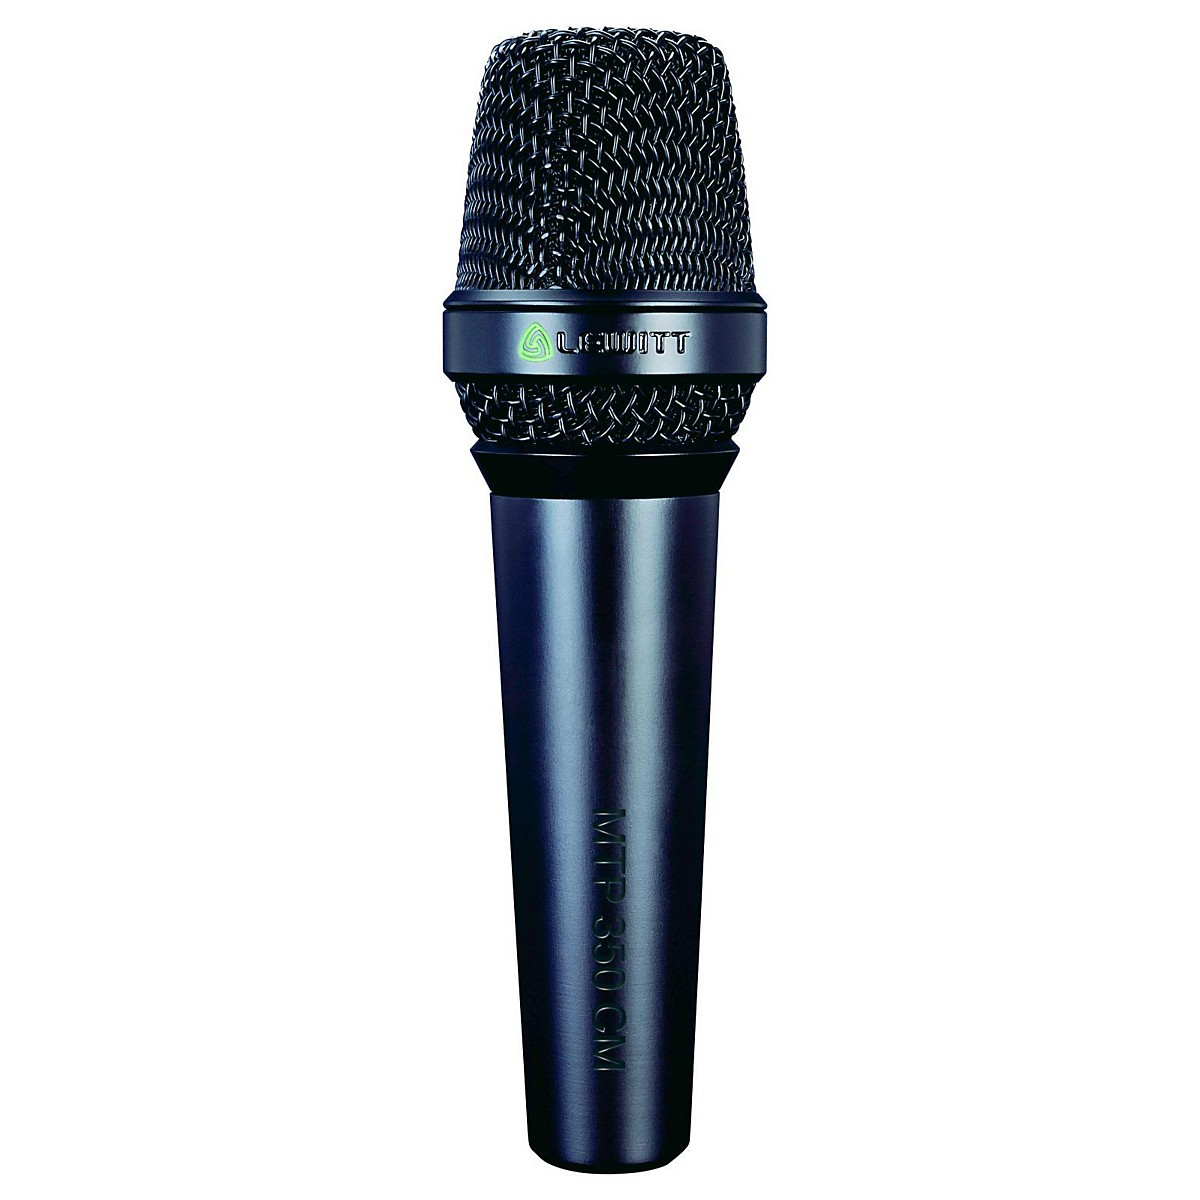 Lewitt Audio Microphones MTP-350-CM Handheld Condenser Micorphone